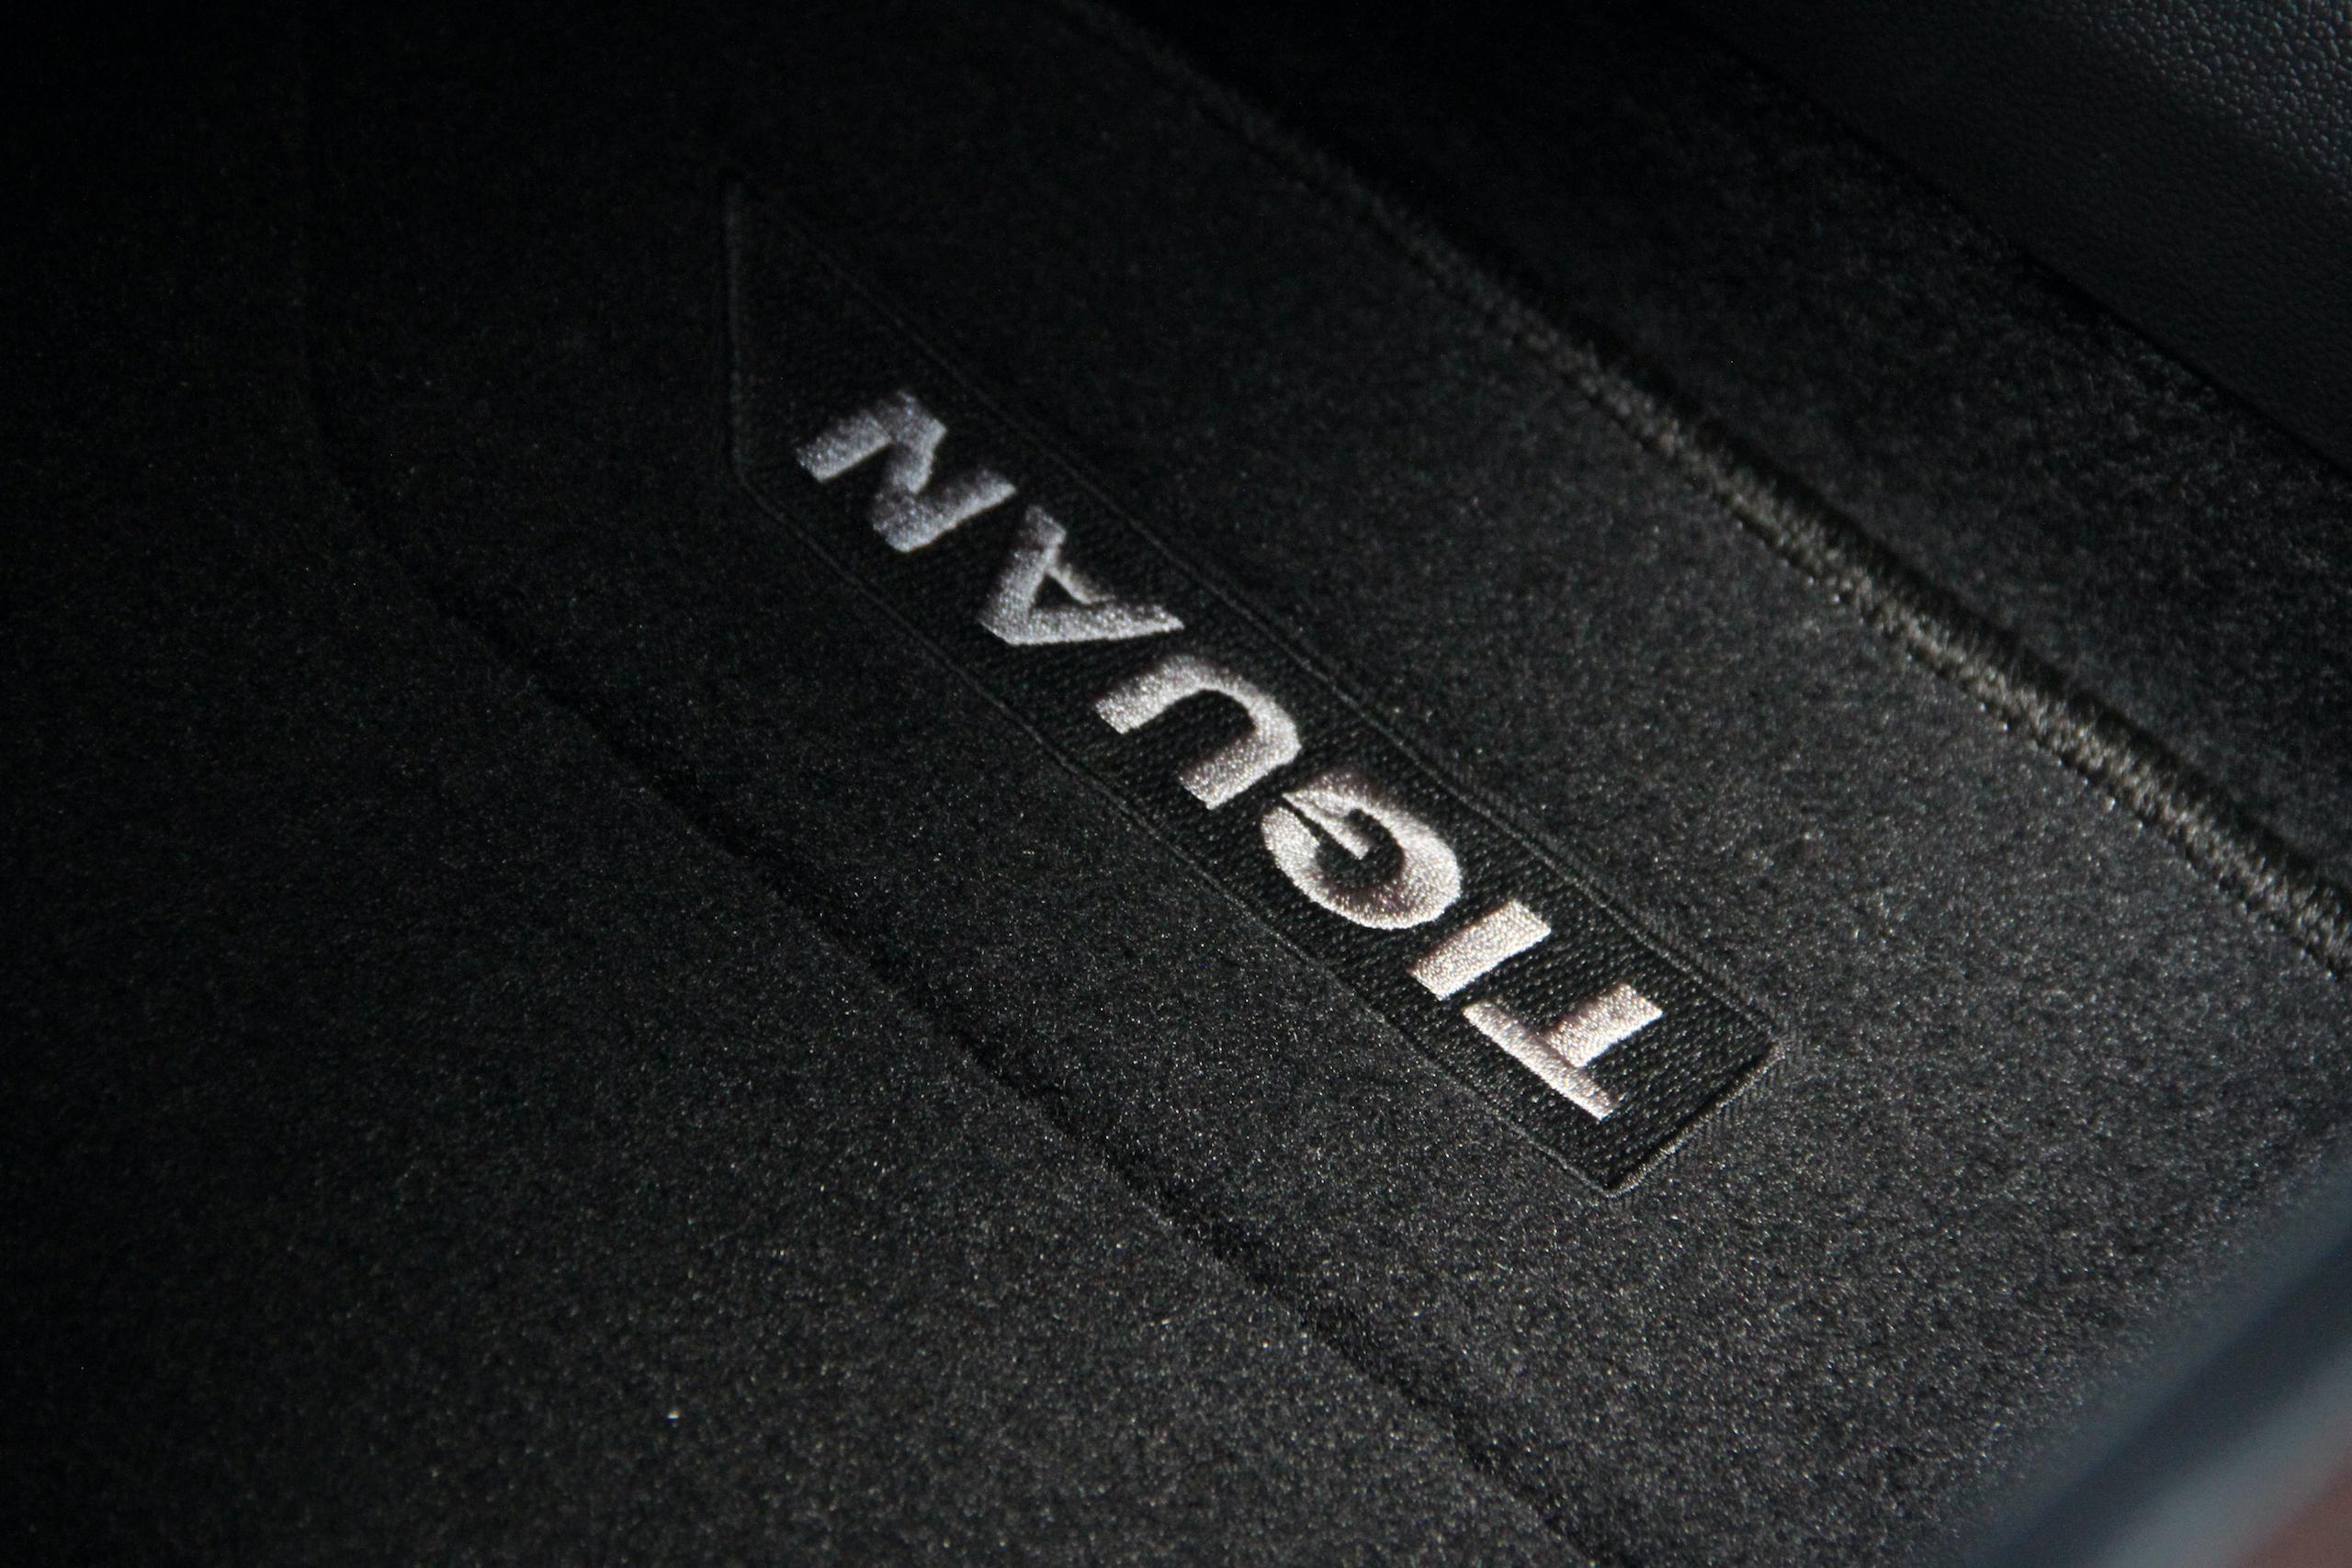 2022 VW Tiguan SEL R-Line floor mat detail